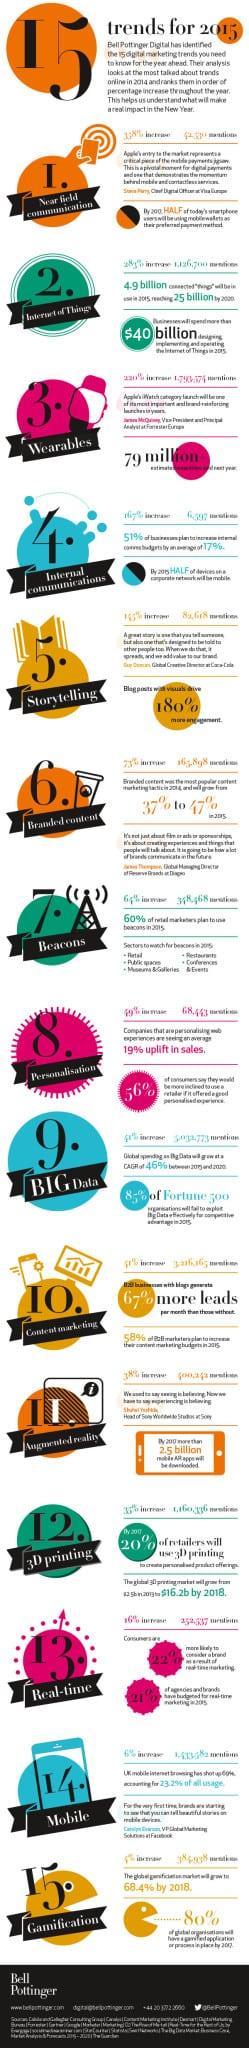 Bell Pottinger Digital trends for 2015 infographic